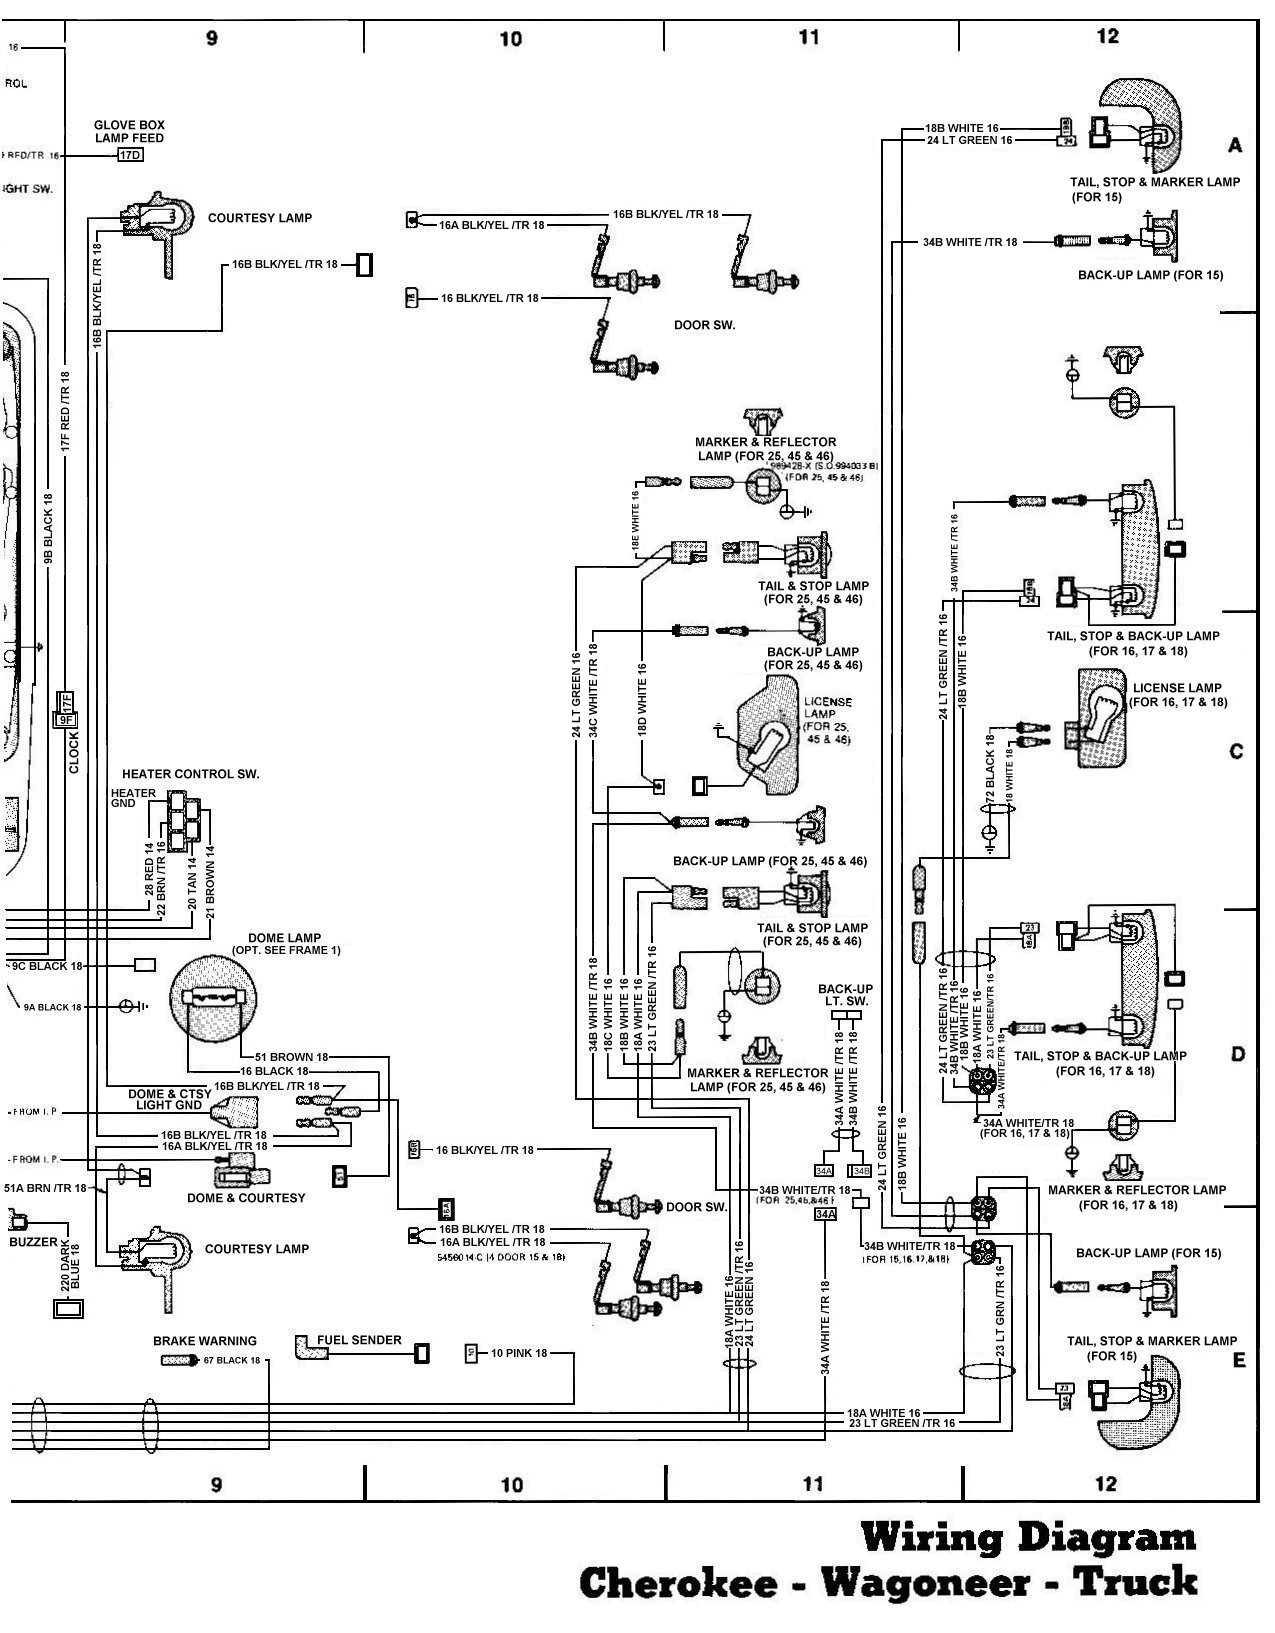 90 chevy corvette ac wiring diagram auto electrical wiring diagram rh collar ga